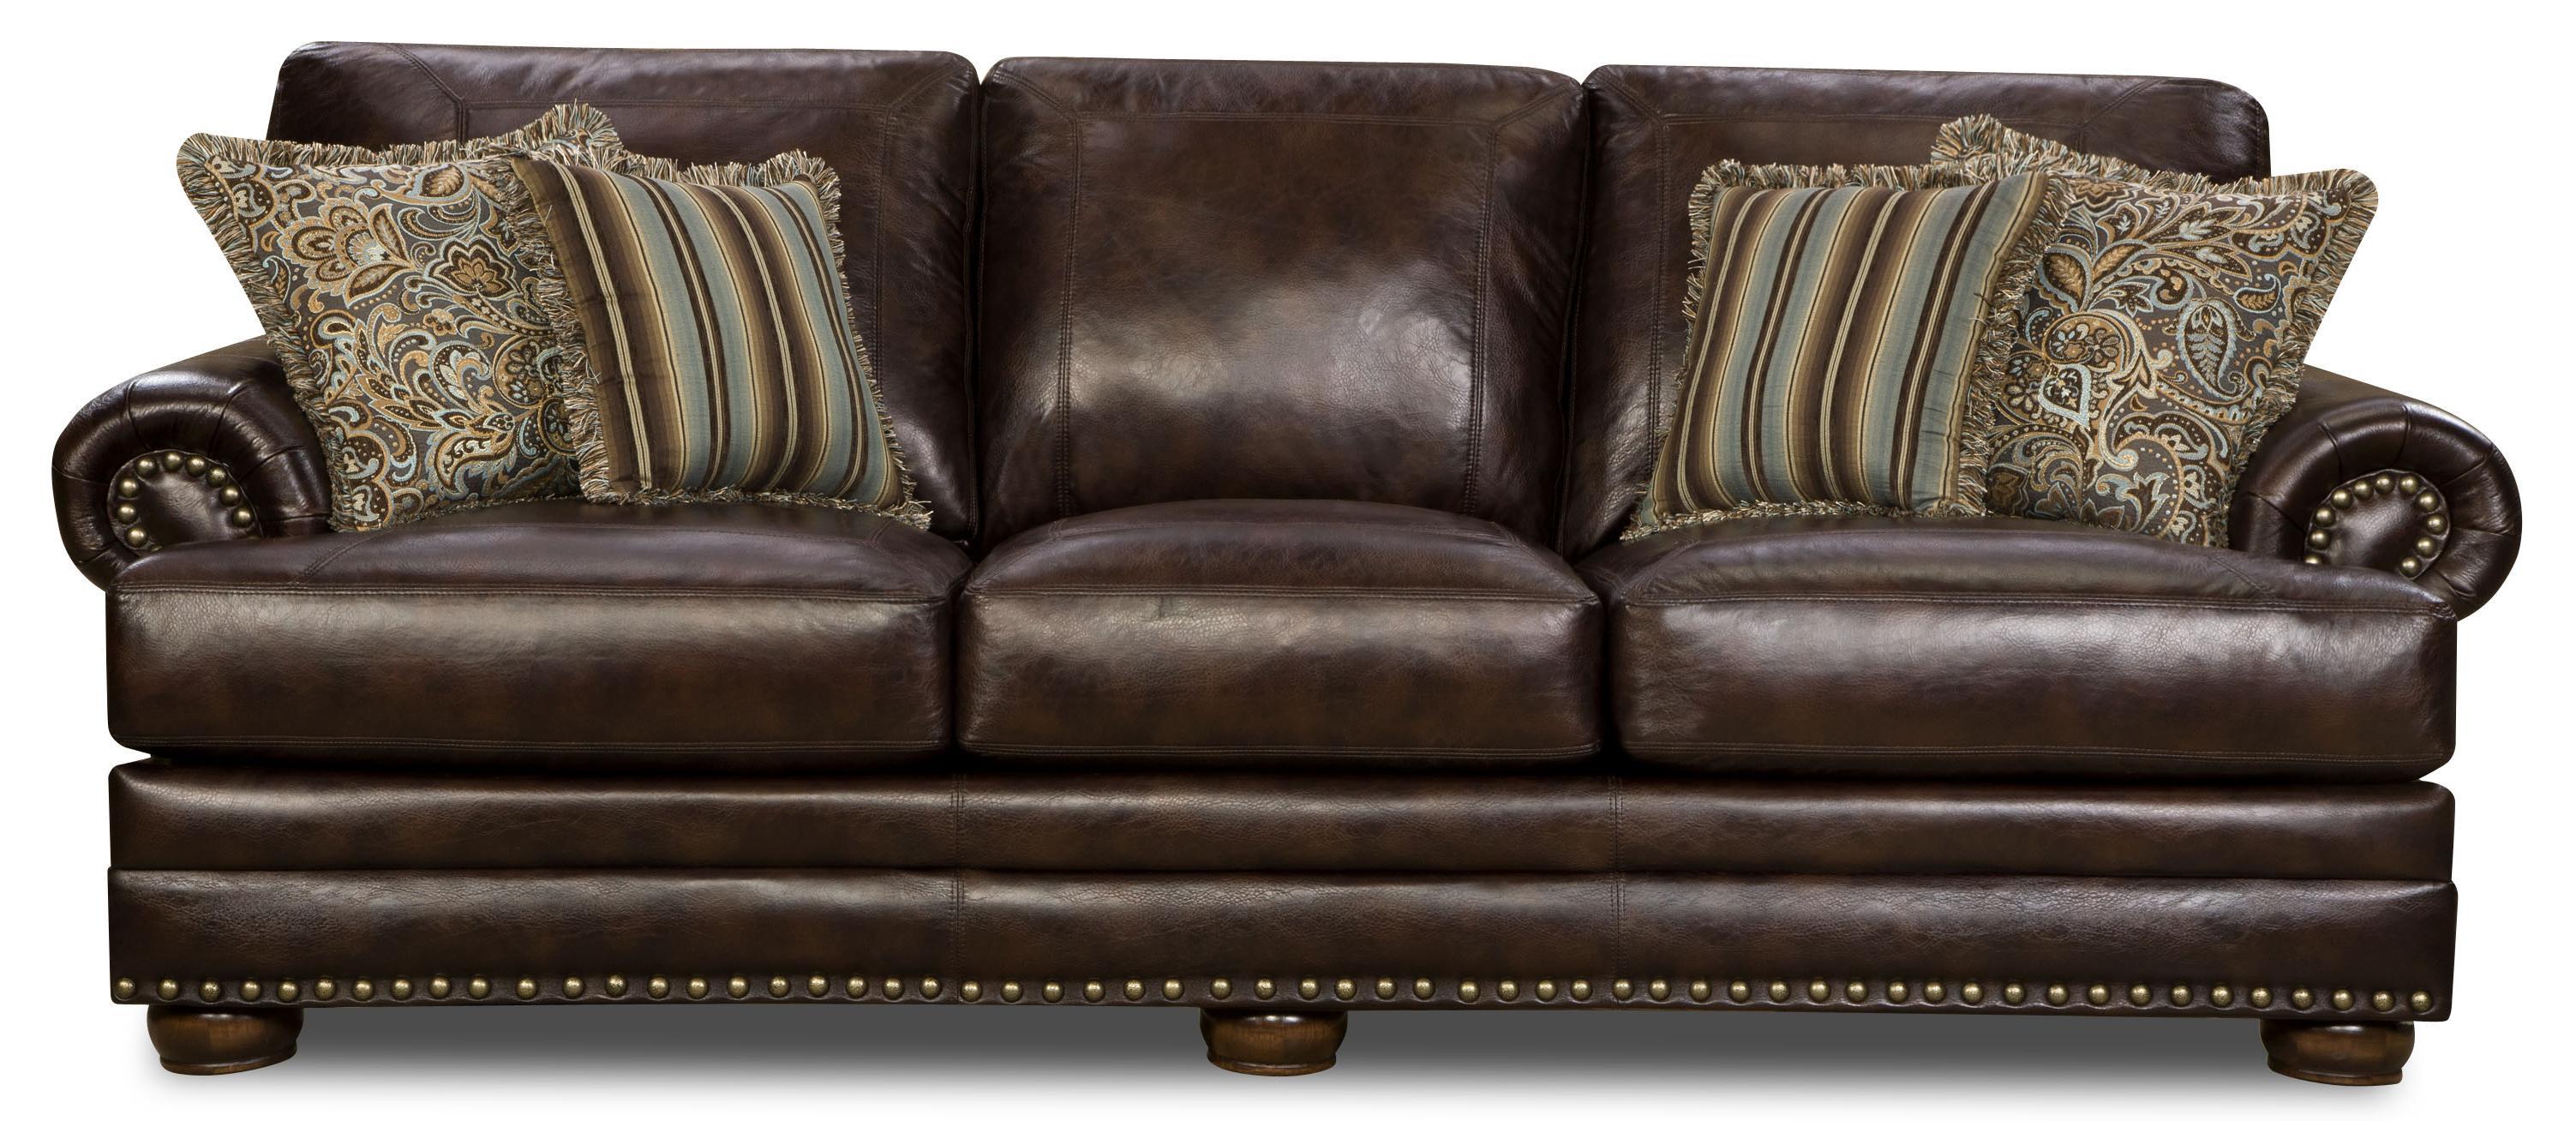 Corinthian 9000                                               Next Week Sofa - Item Number: 9003